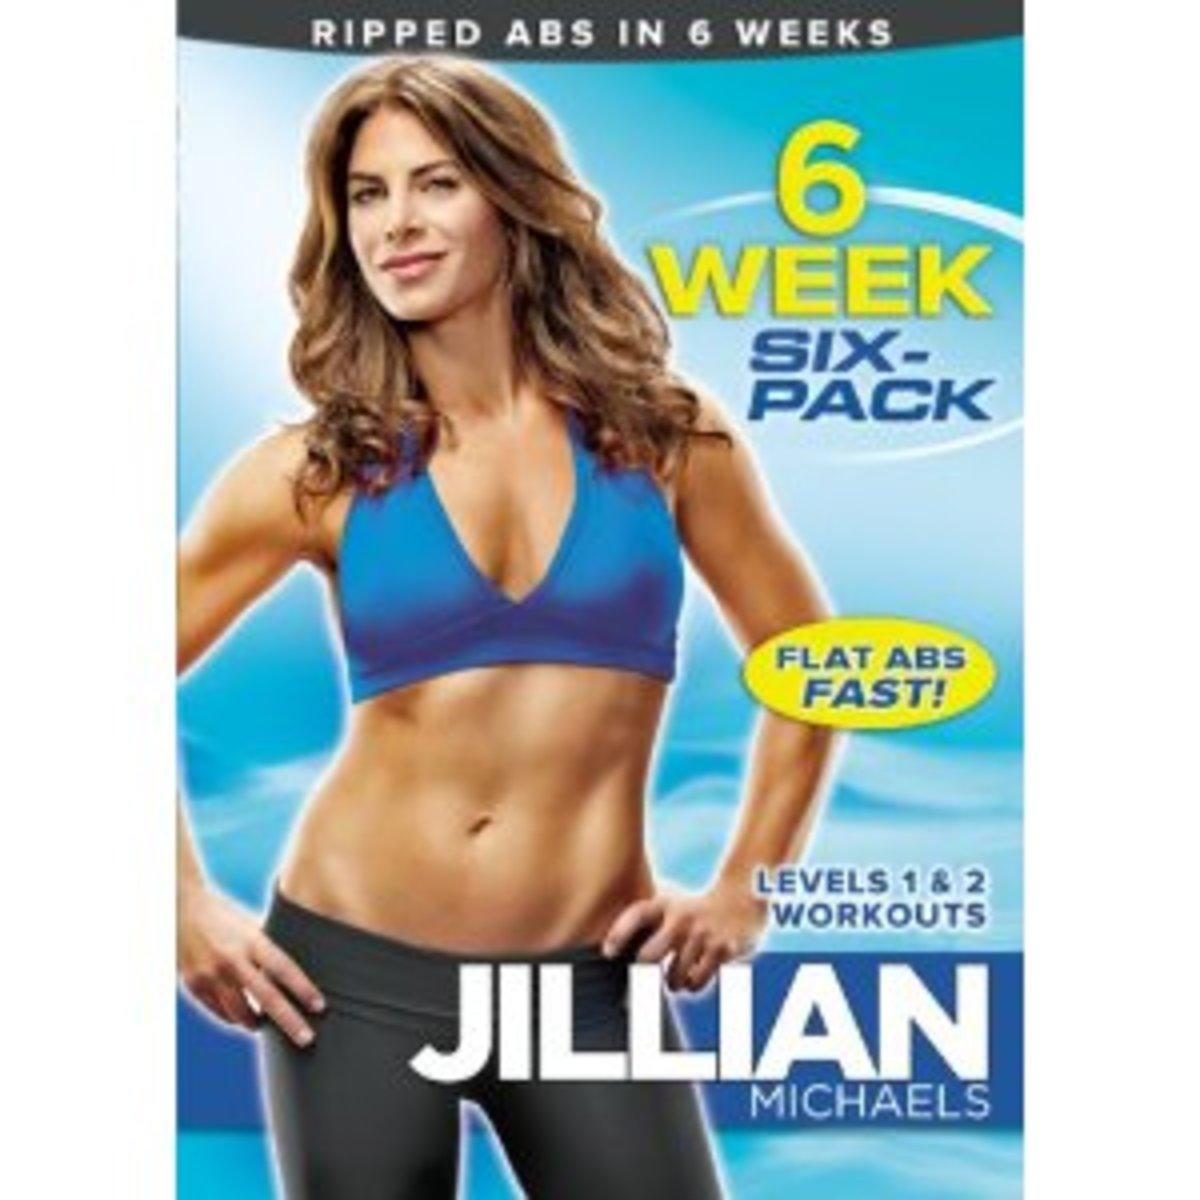 jillian michaels 6 week 6-pack